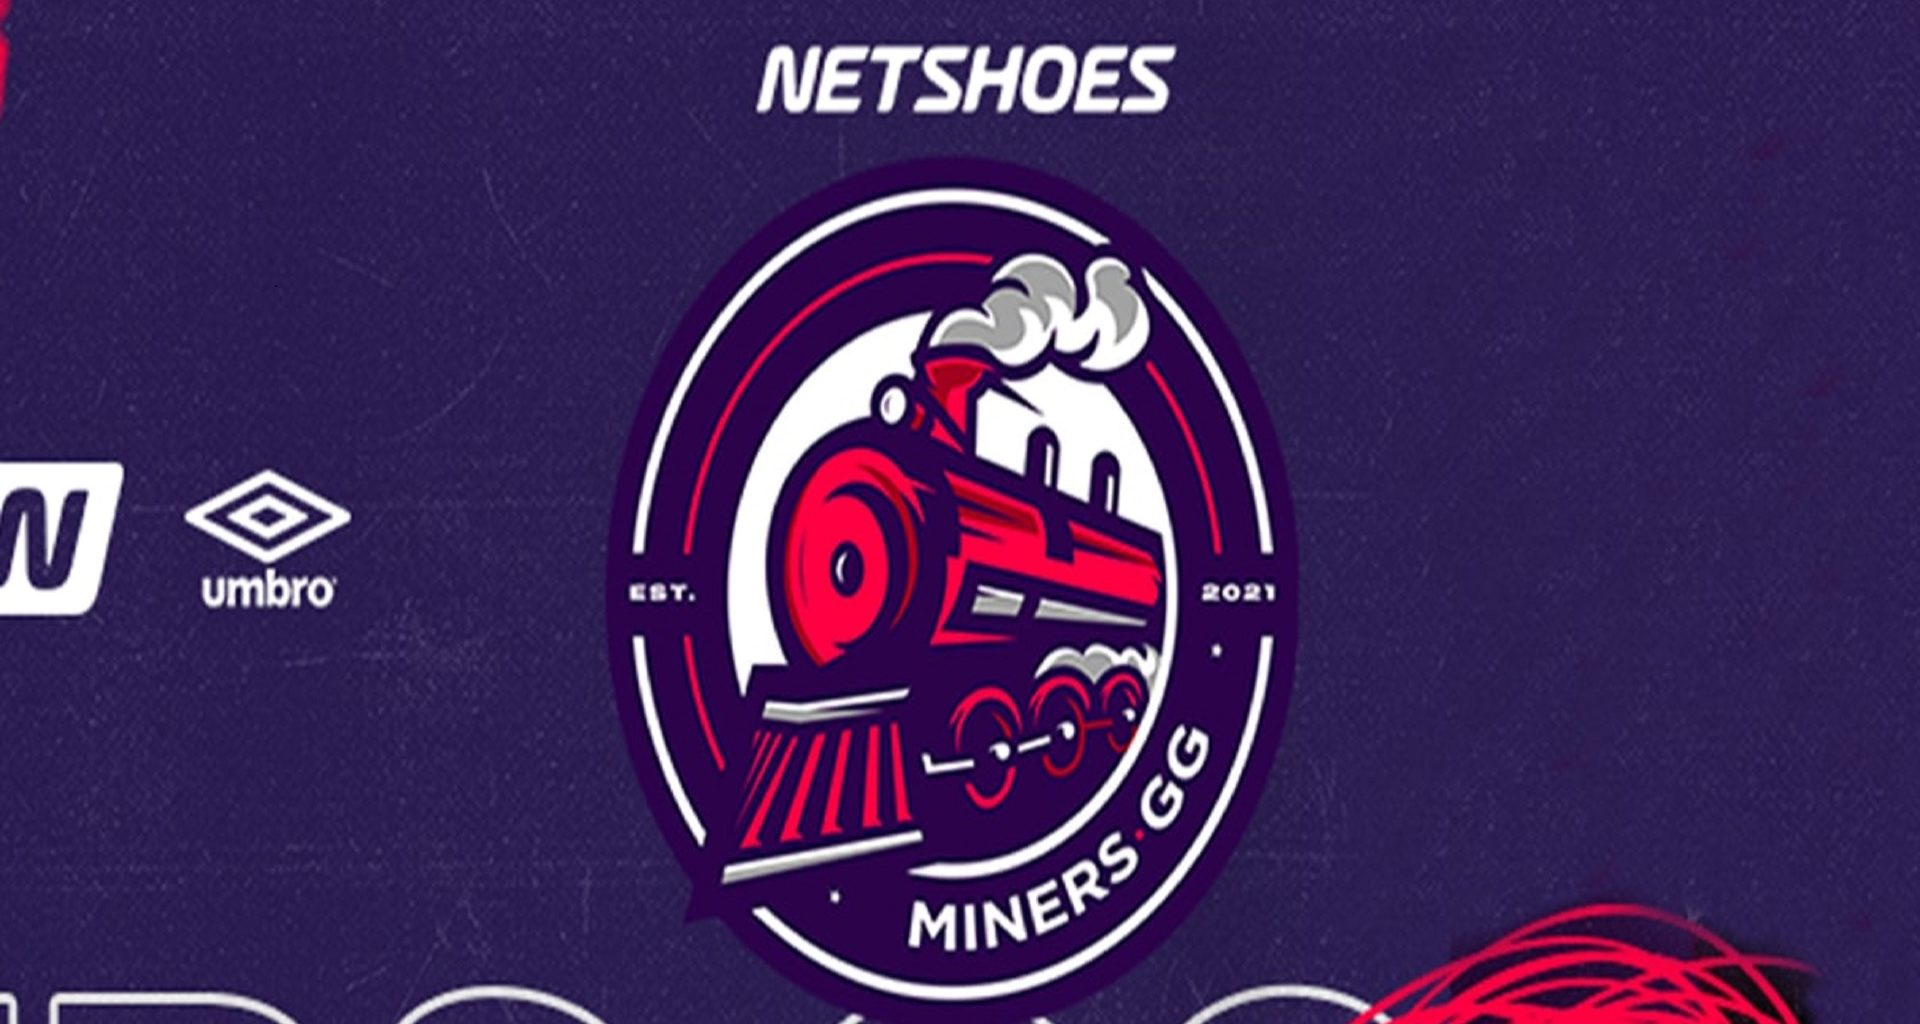 netshoes miners logo